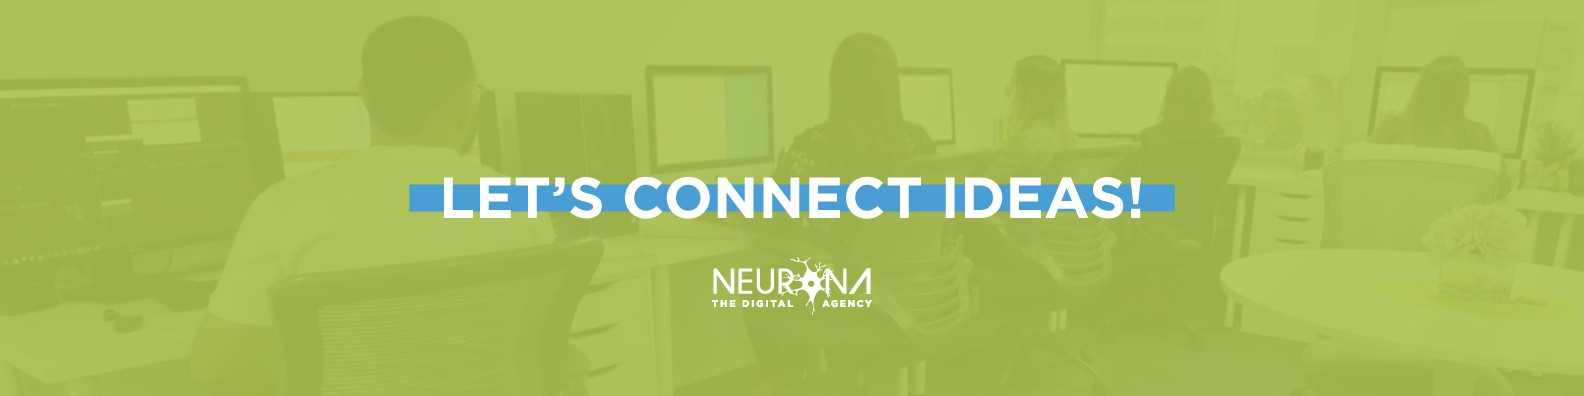 Neurona Digital Agency   LinkedIn